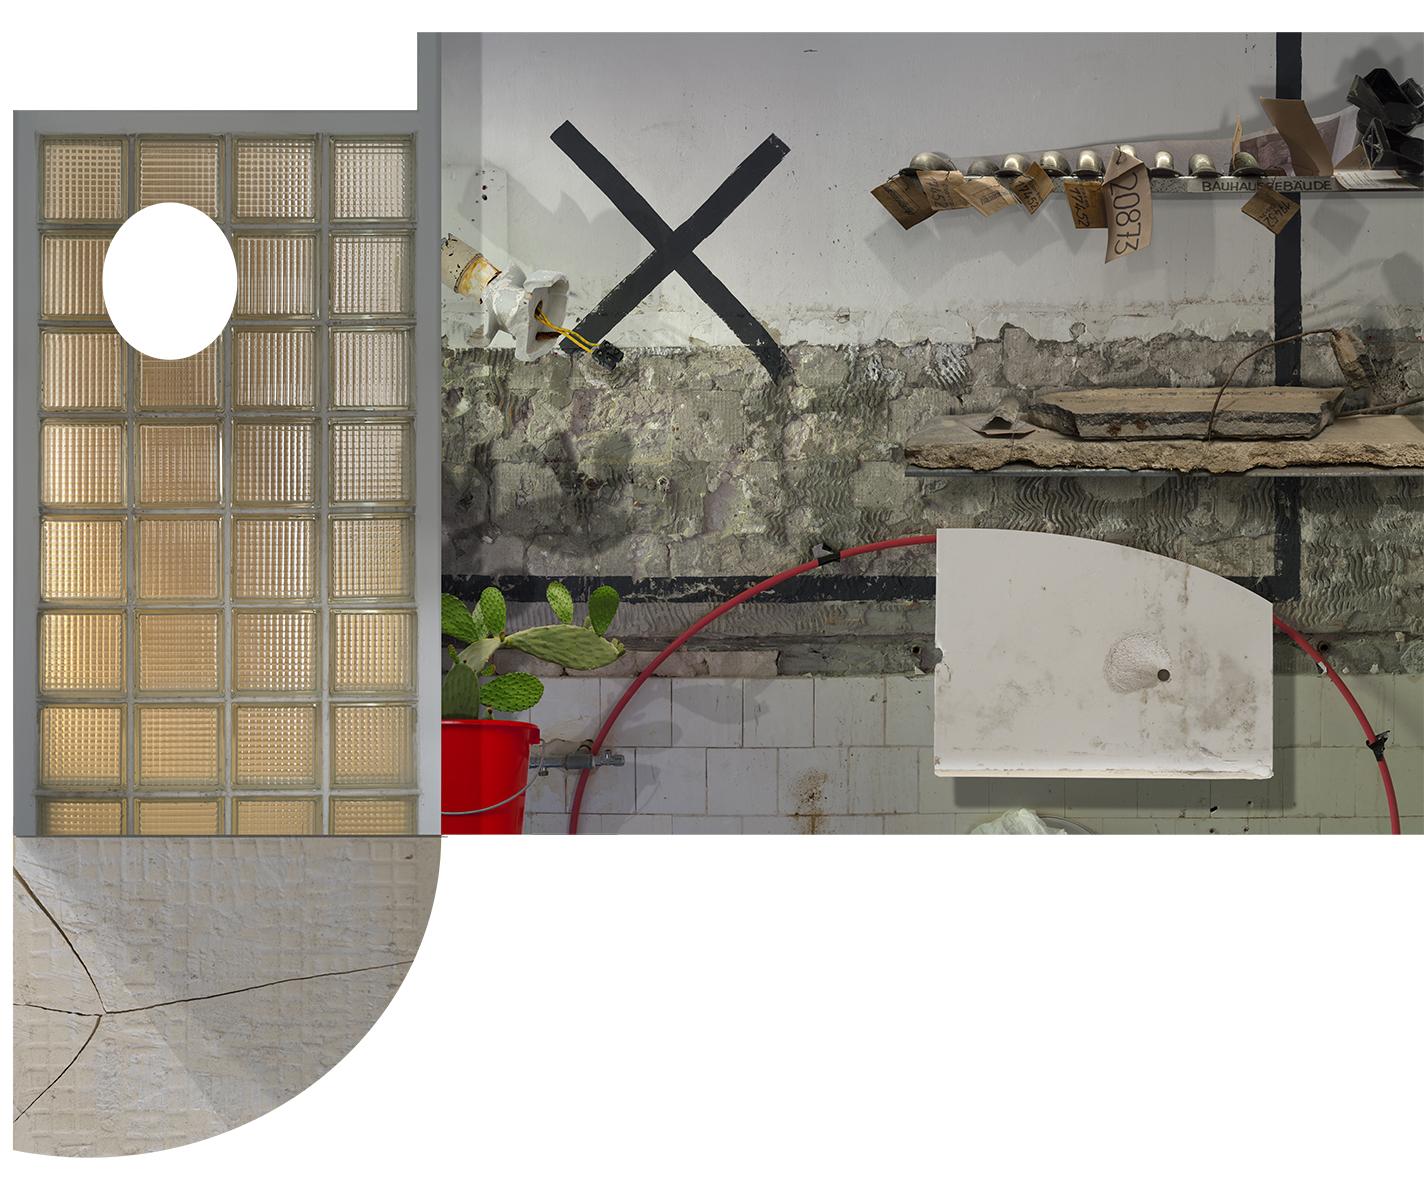 Bricolage (III), 2019, Inkjet print, 117.2X146.9 cm